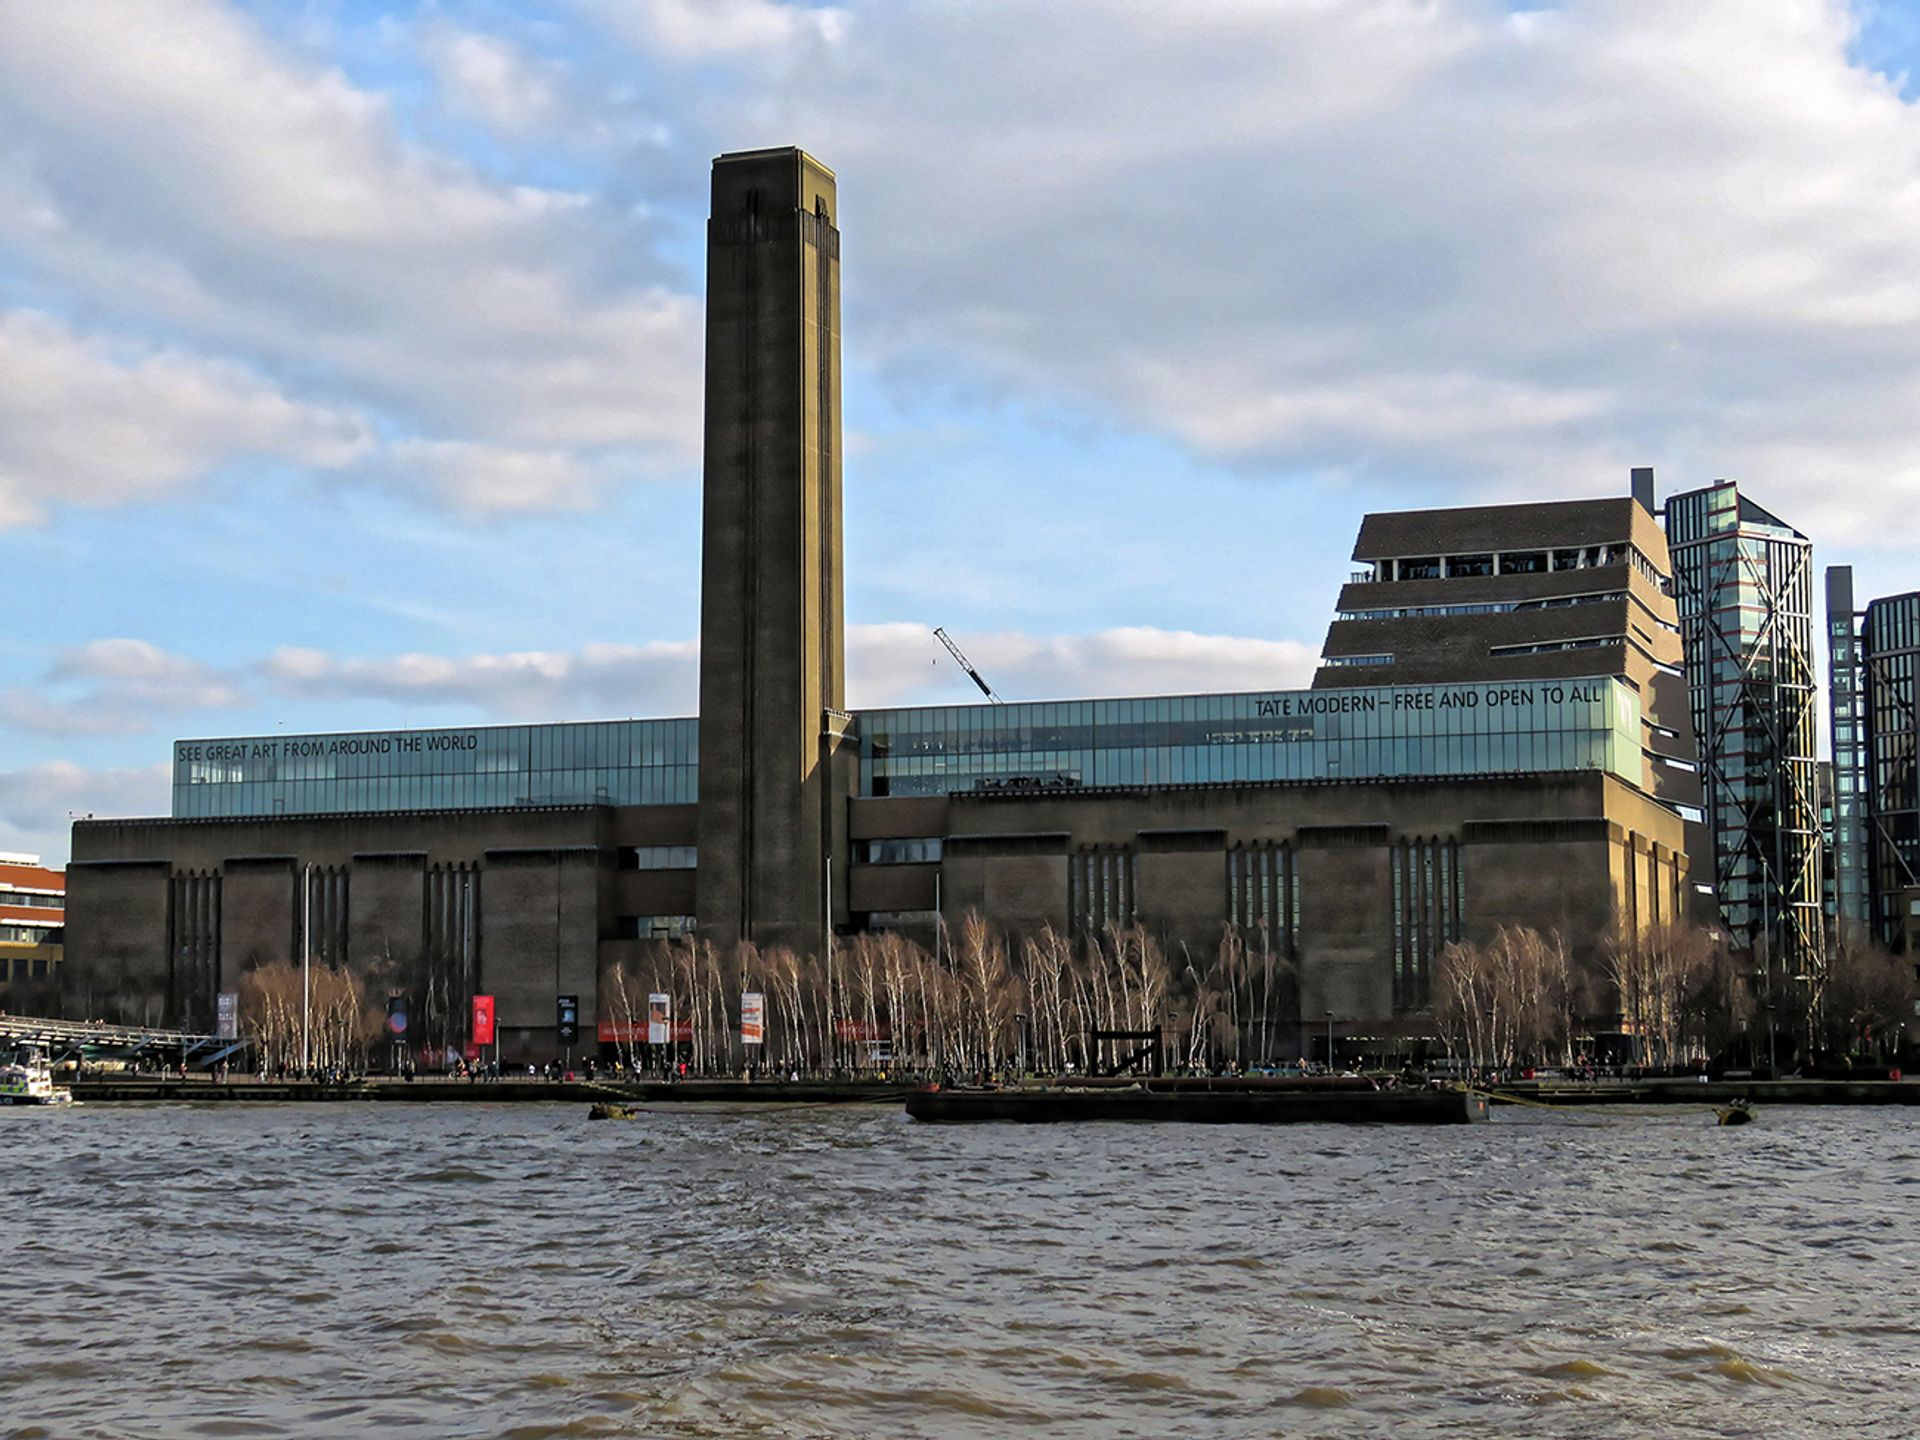 Tate Modern Photo: Acabashi/CC